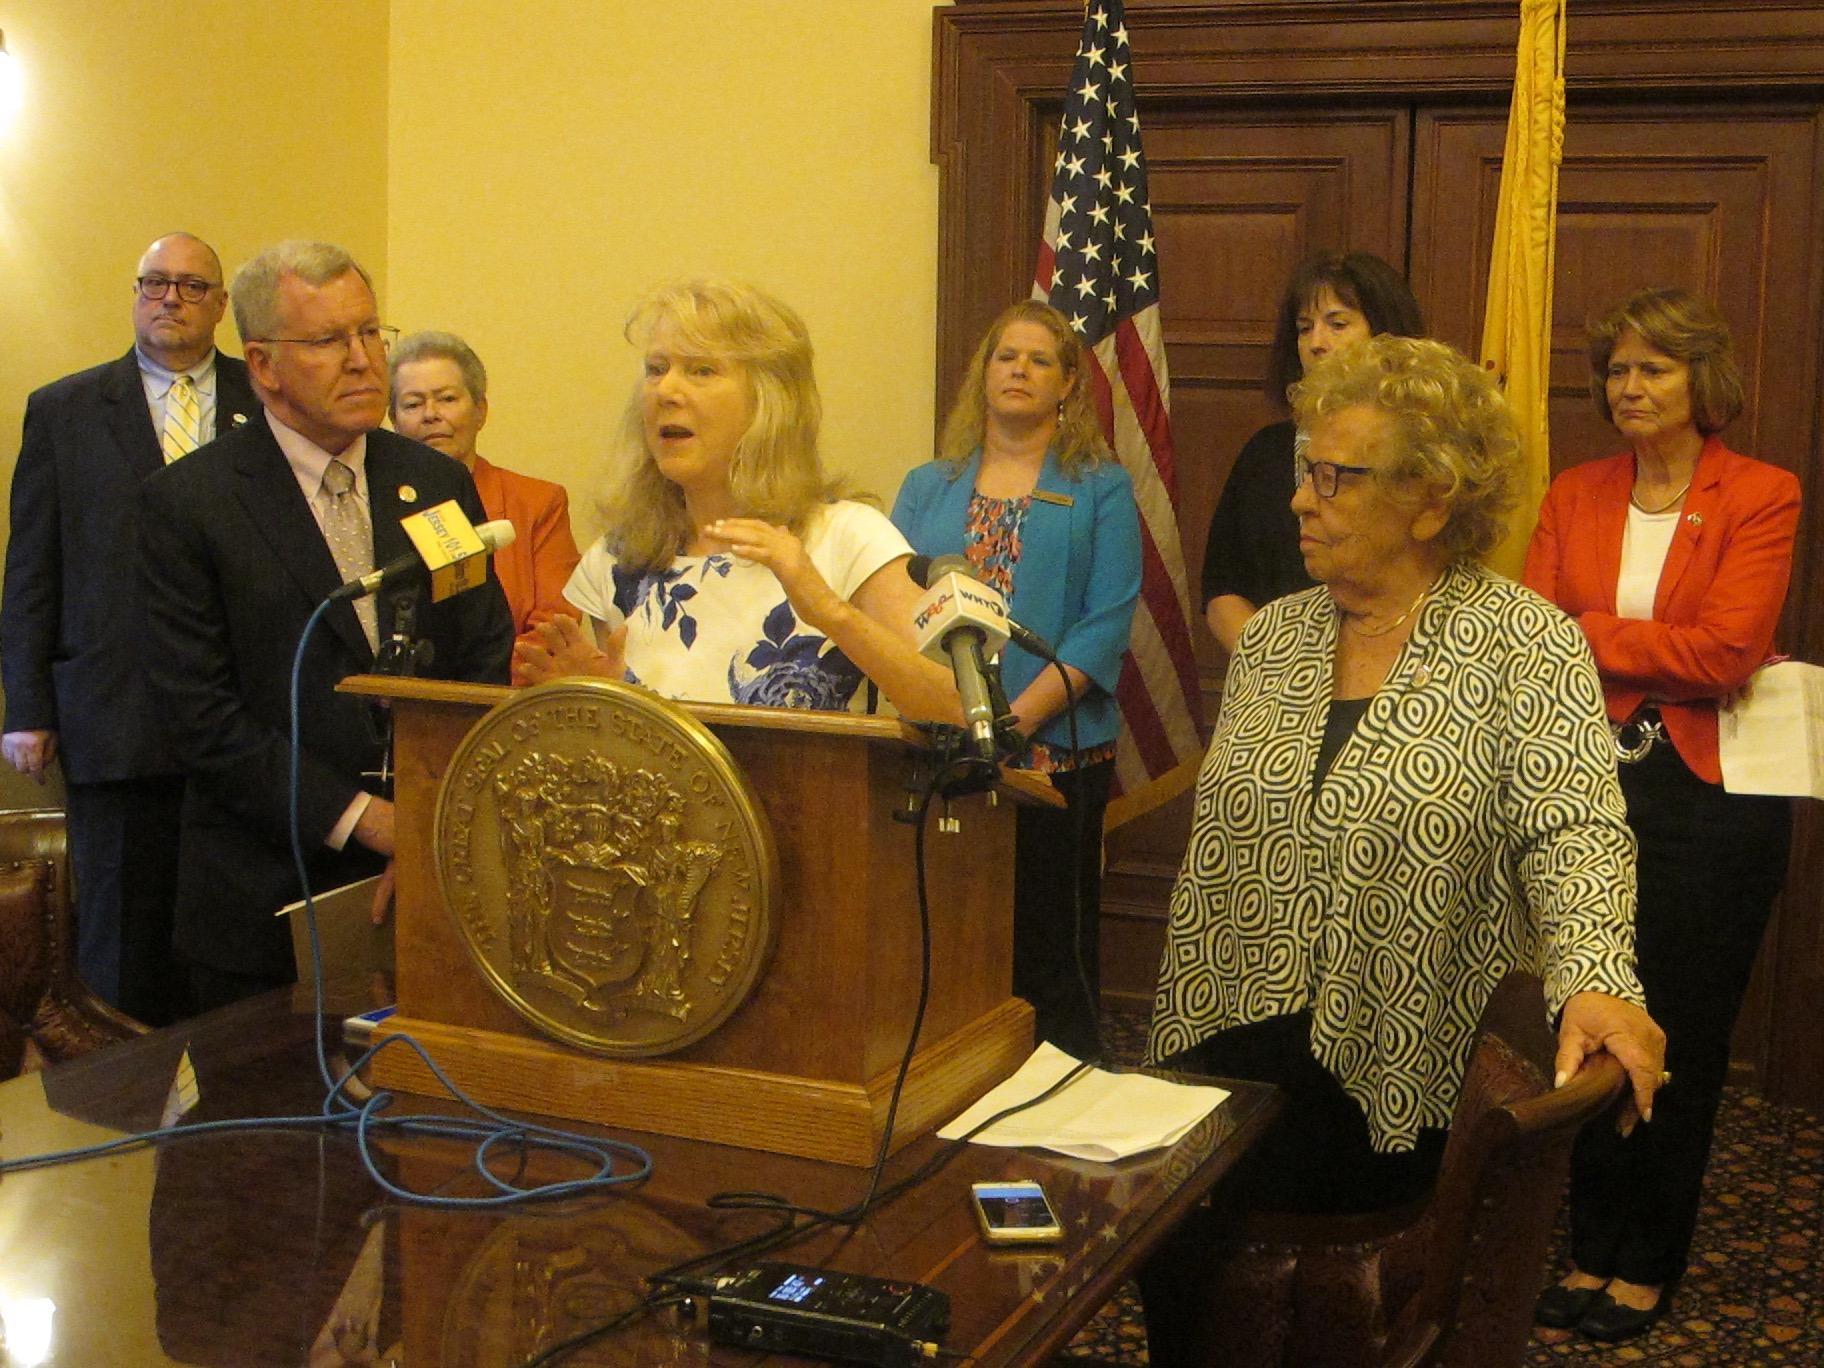 Action Urged To Resolve Backlog In Approving NJ Nursing